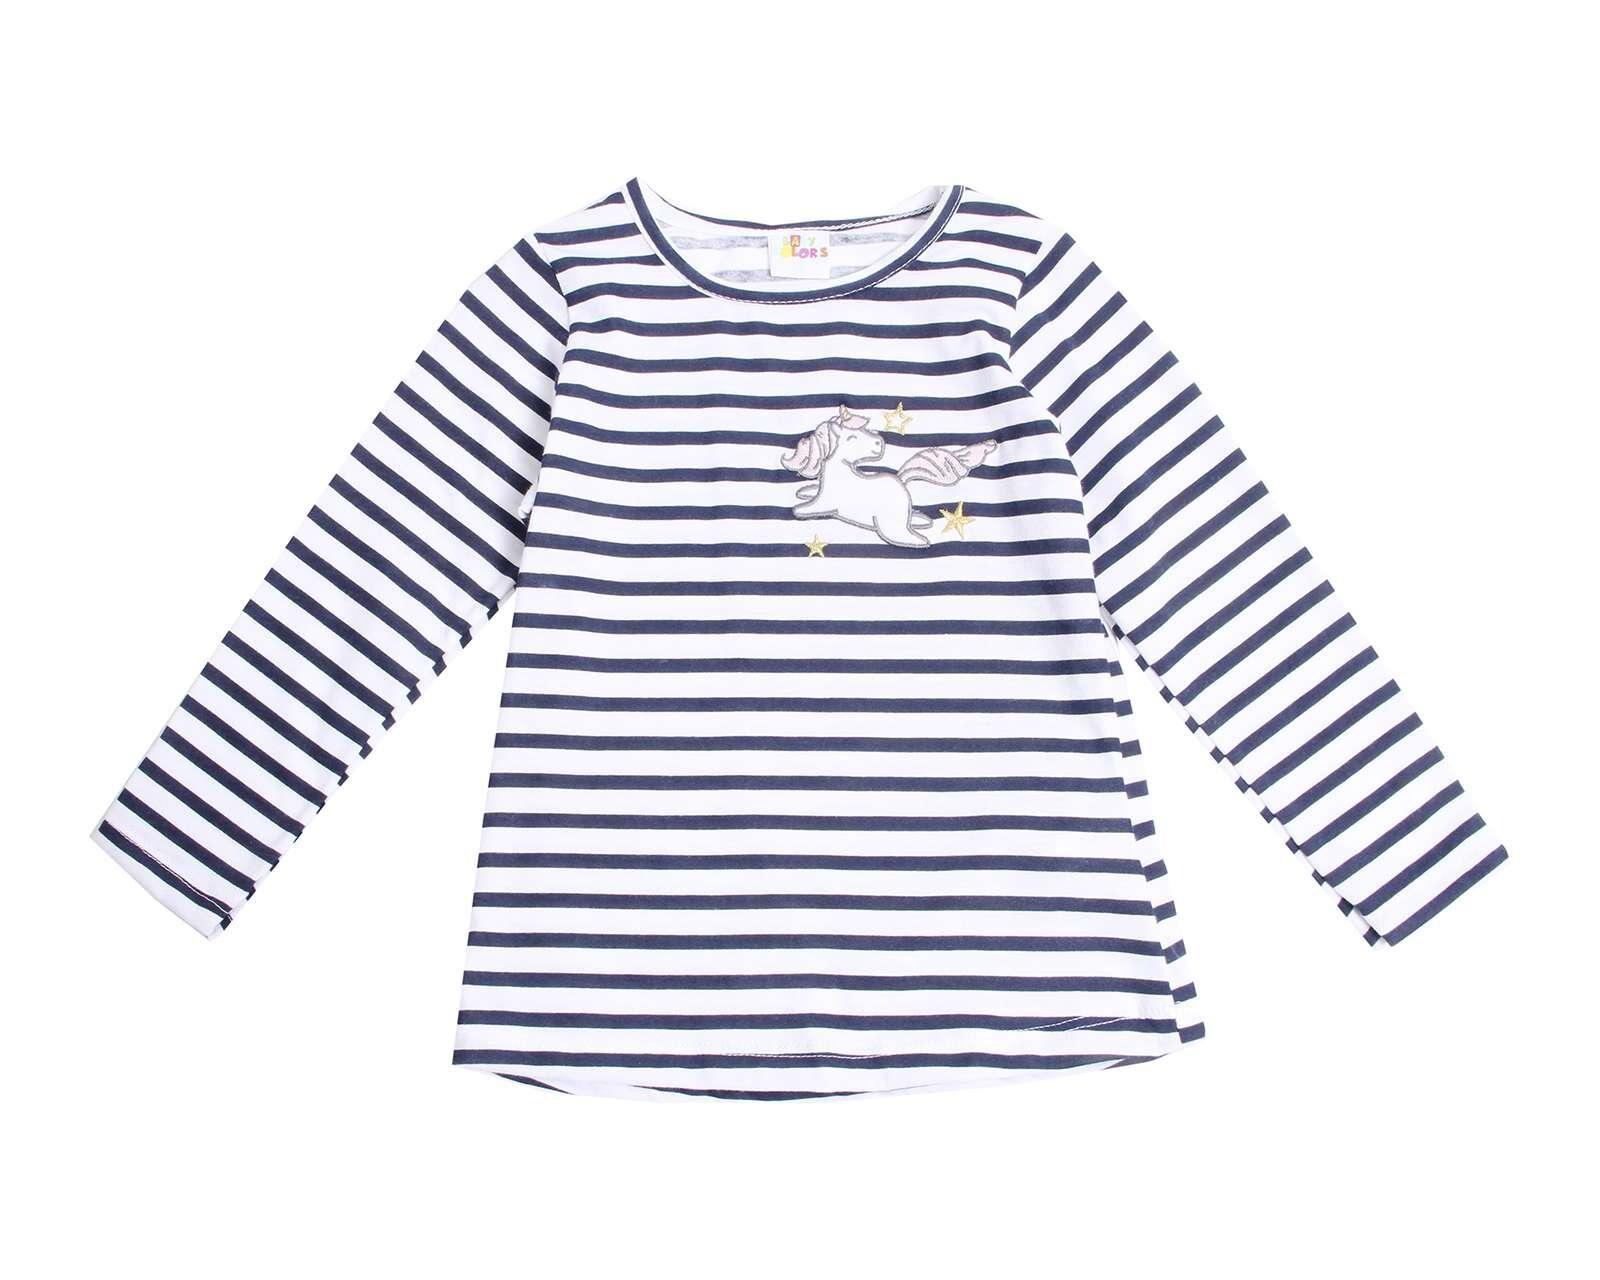 Foto 1 Playera de Algodón Azul marca Baby Colors para Bebé Niña